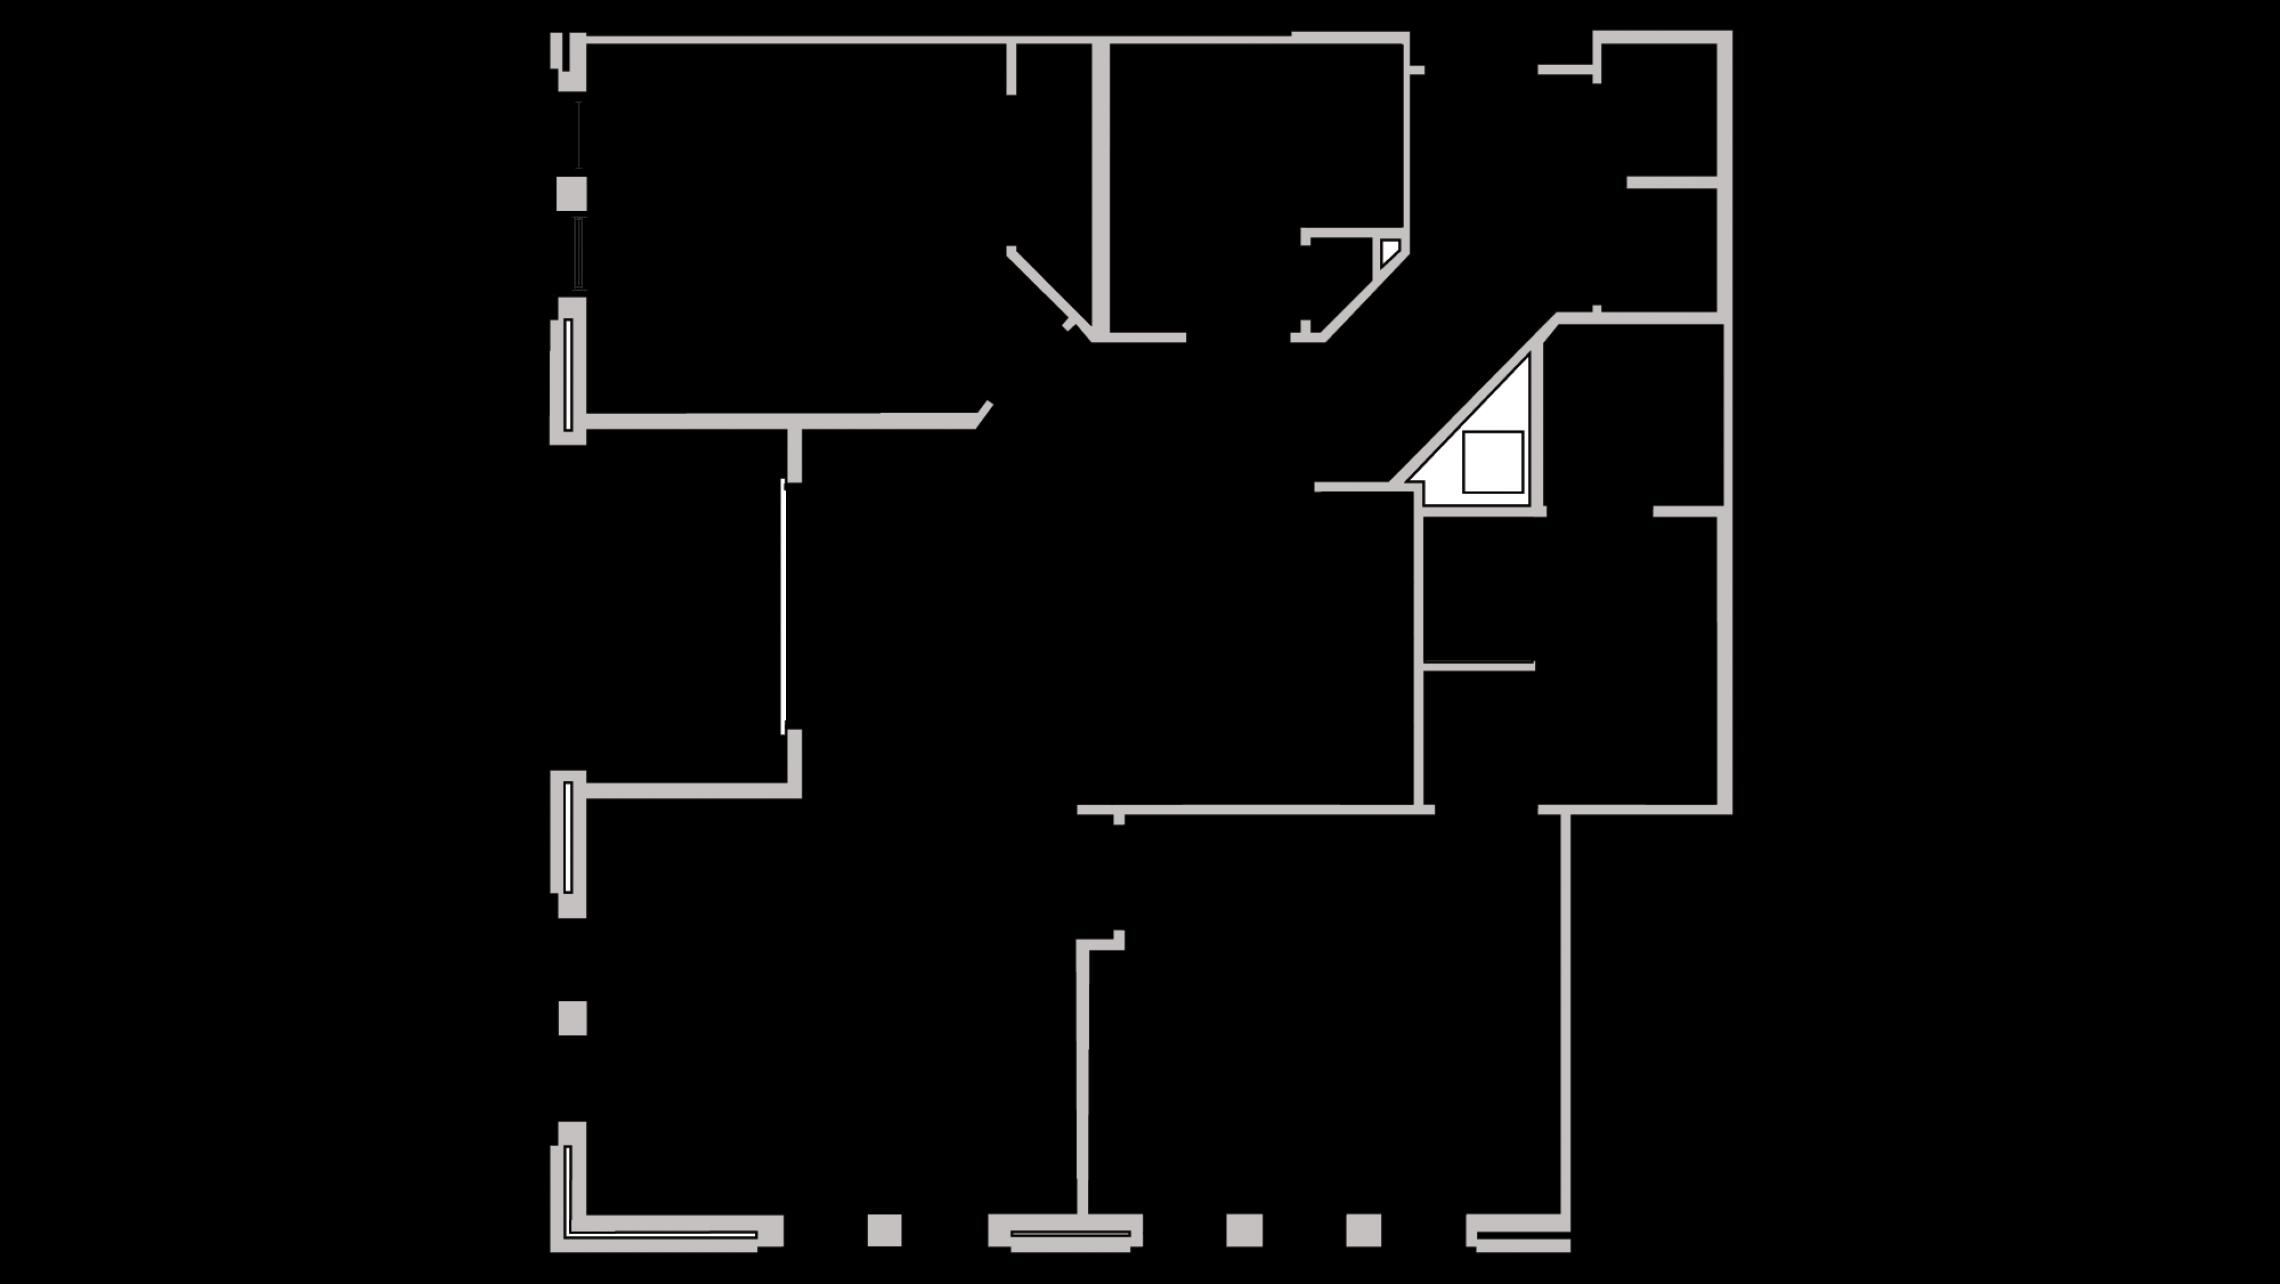 ULI The Depot 1-302 - Two Bedroom, Two Bathroom